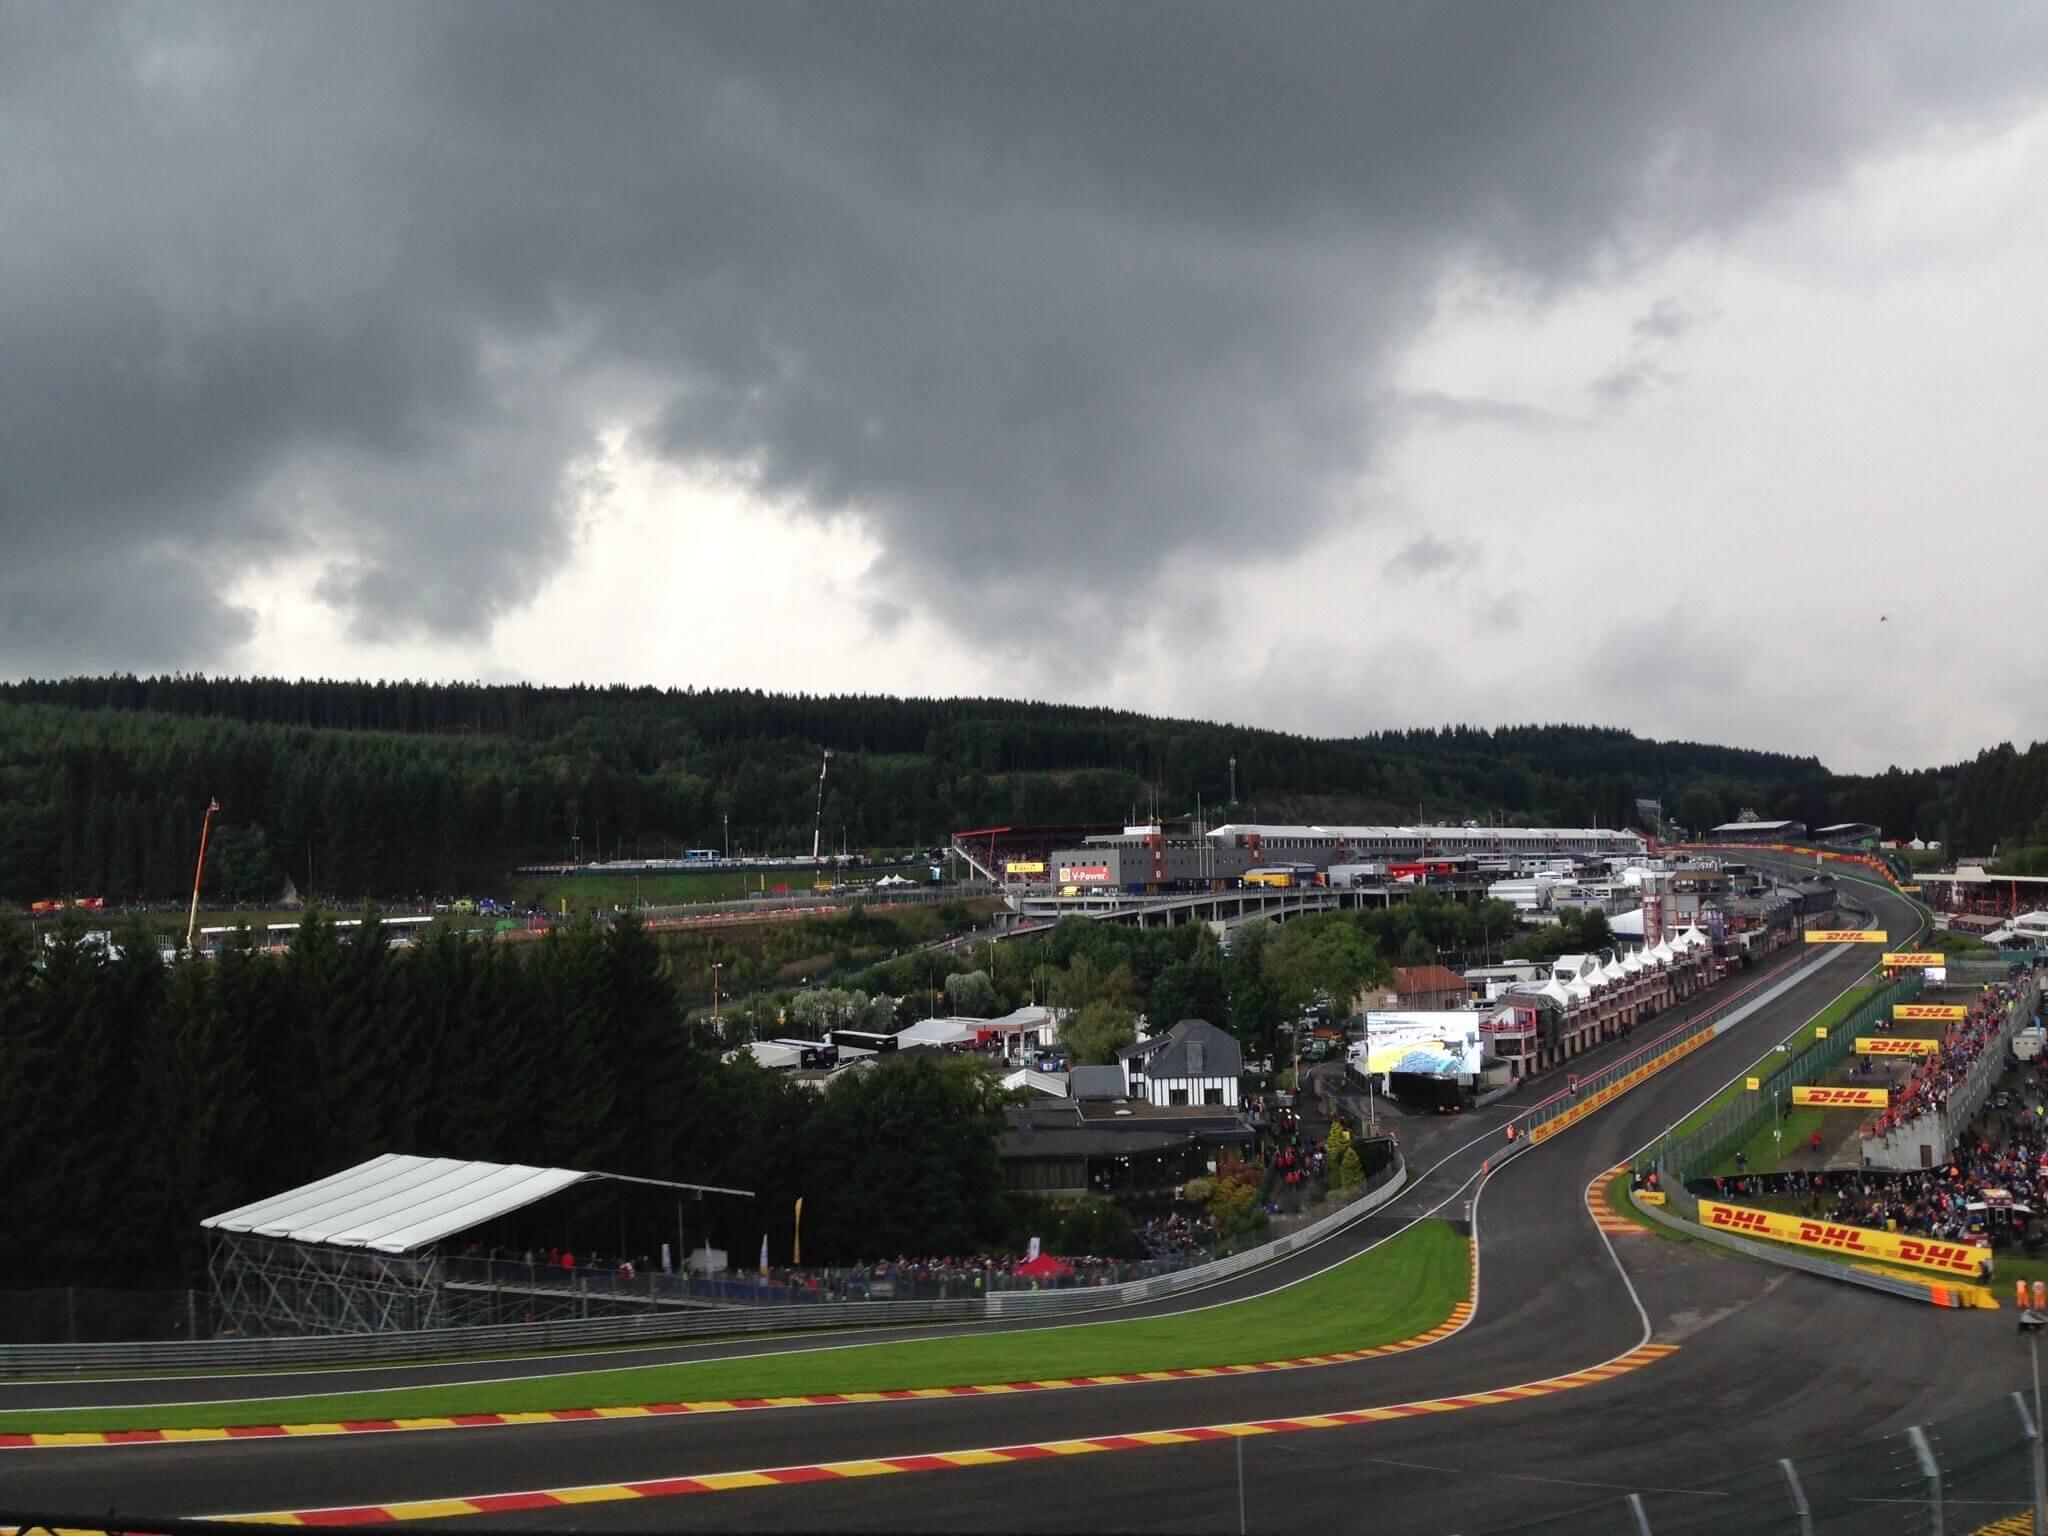 International GT Open Spa Francorchamps 2021